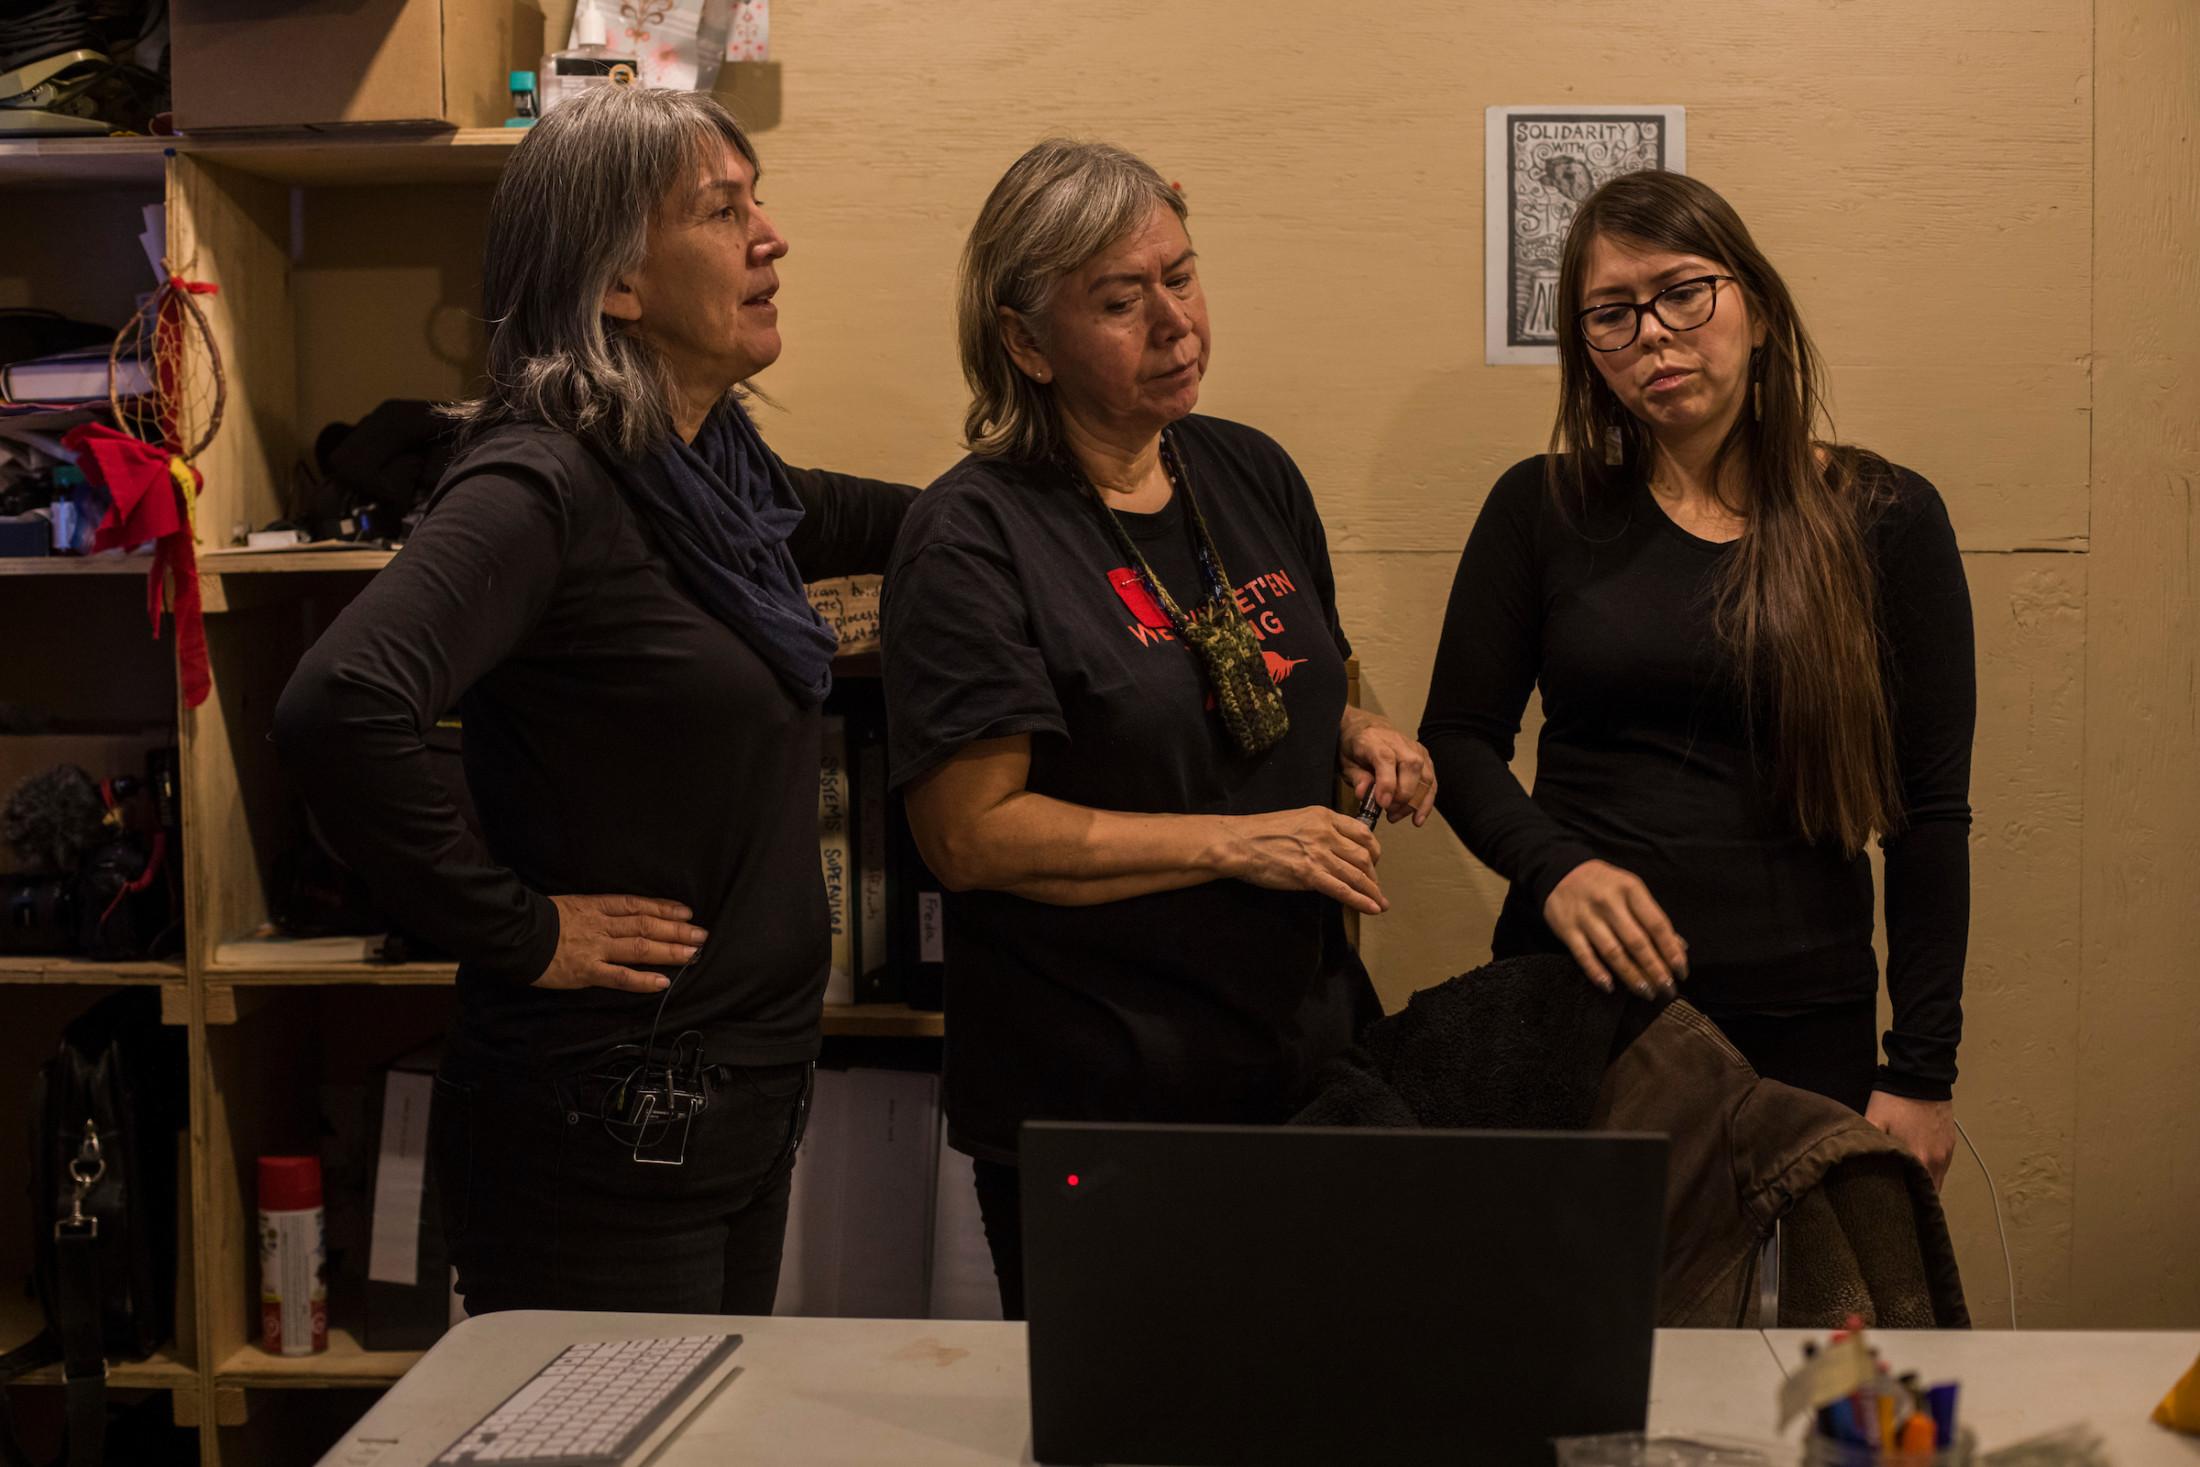 Freda Huson, Brenda Michell, Karla Tait